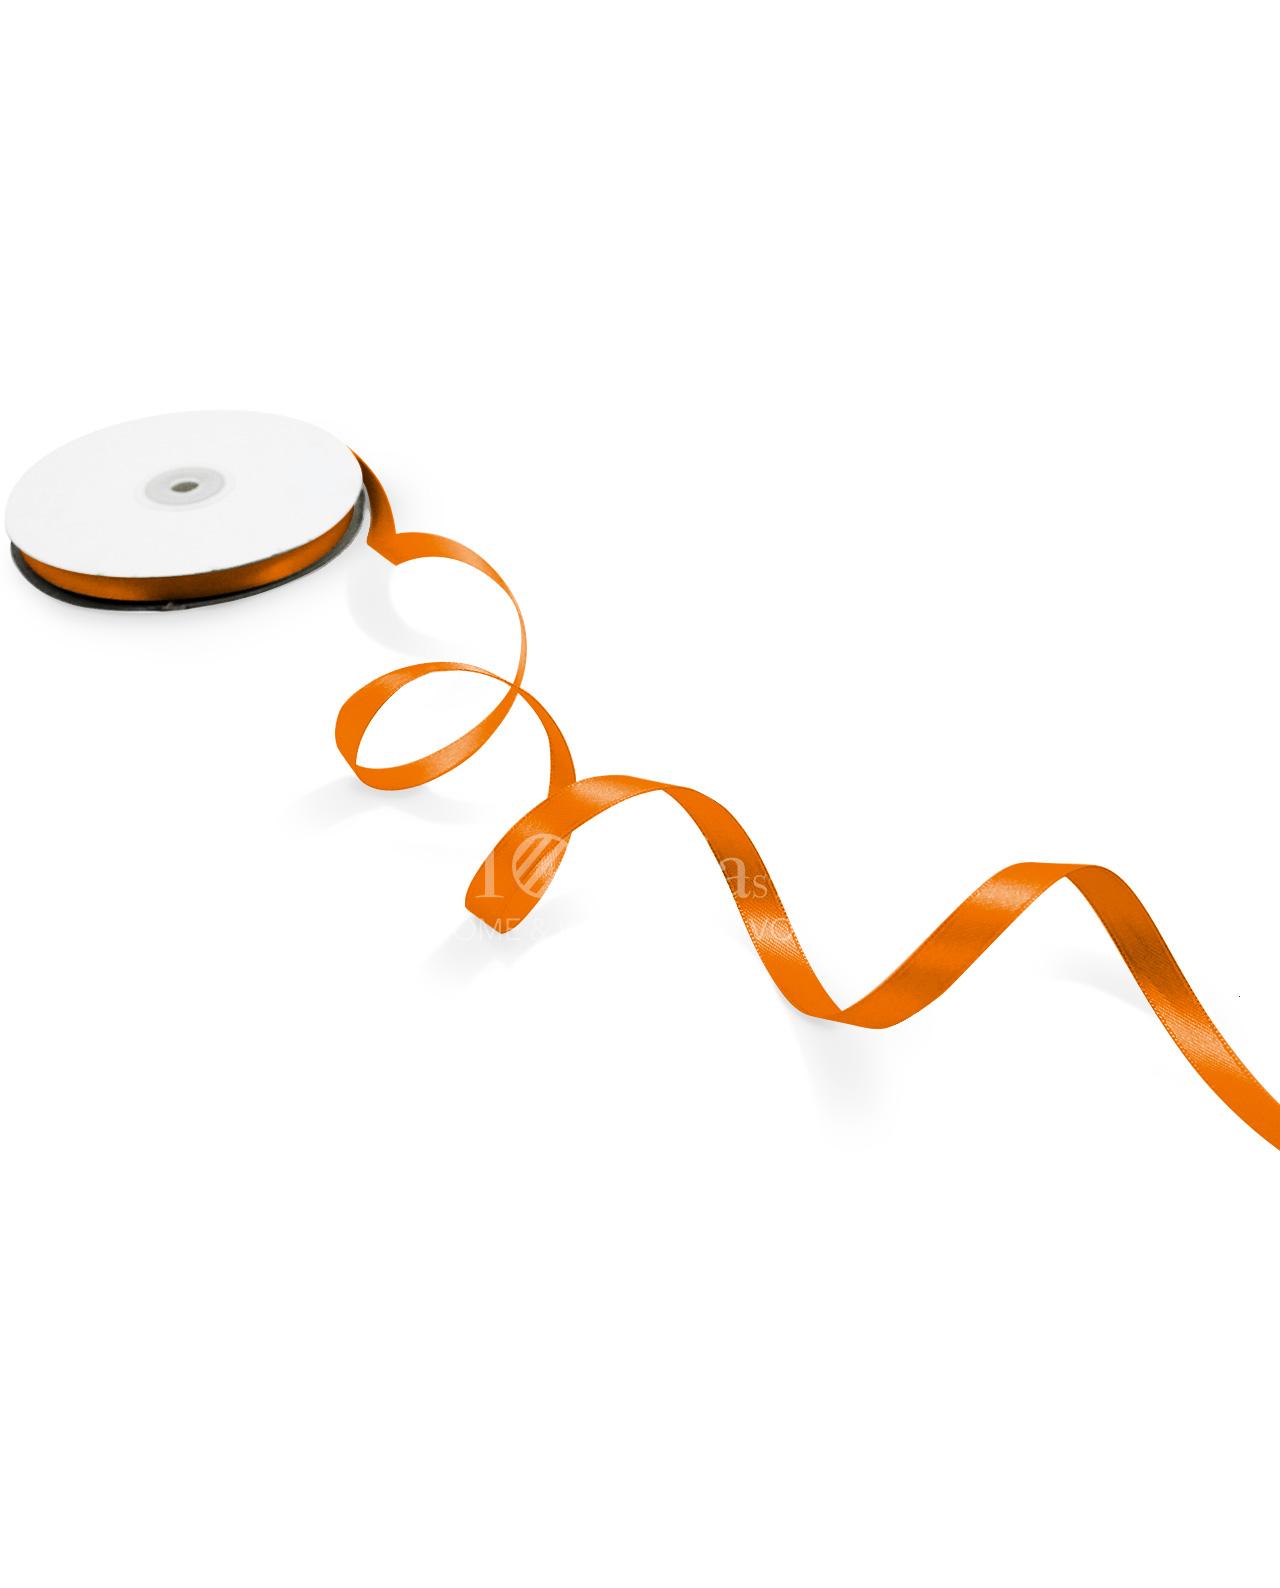 nastro-in doppio raso 1cm-arancio-caldo-13